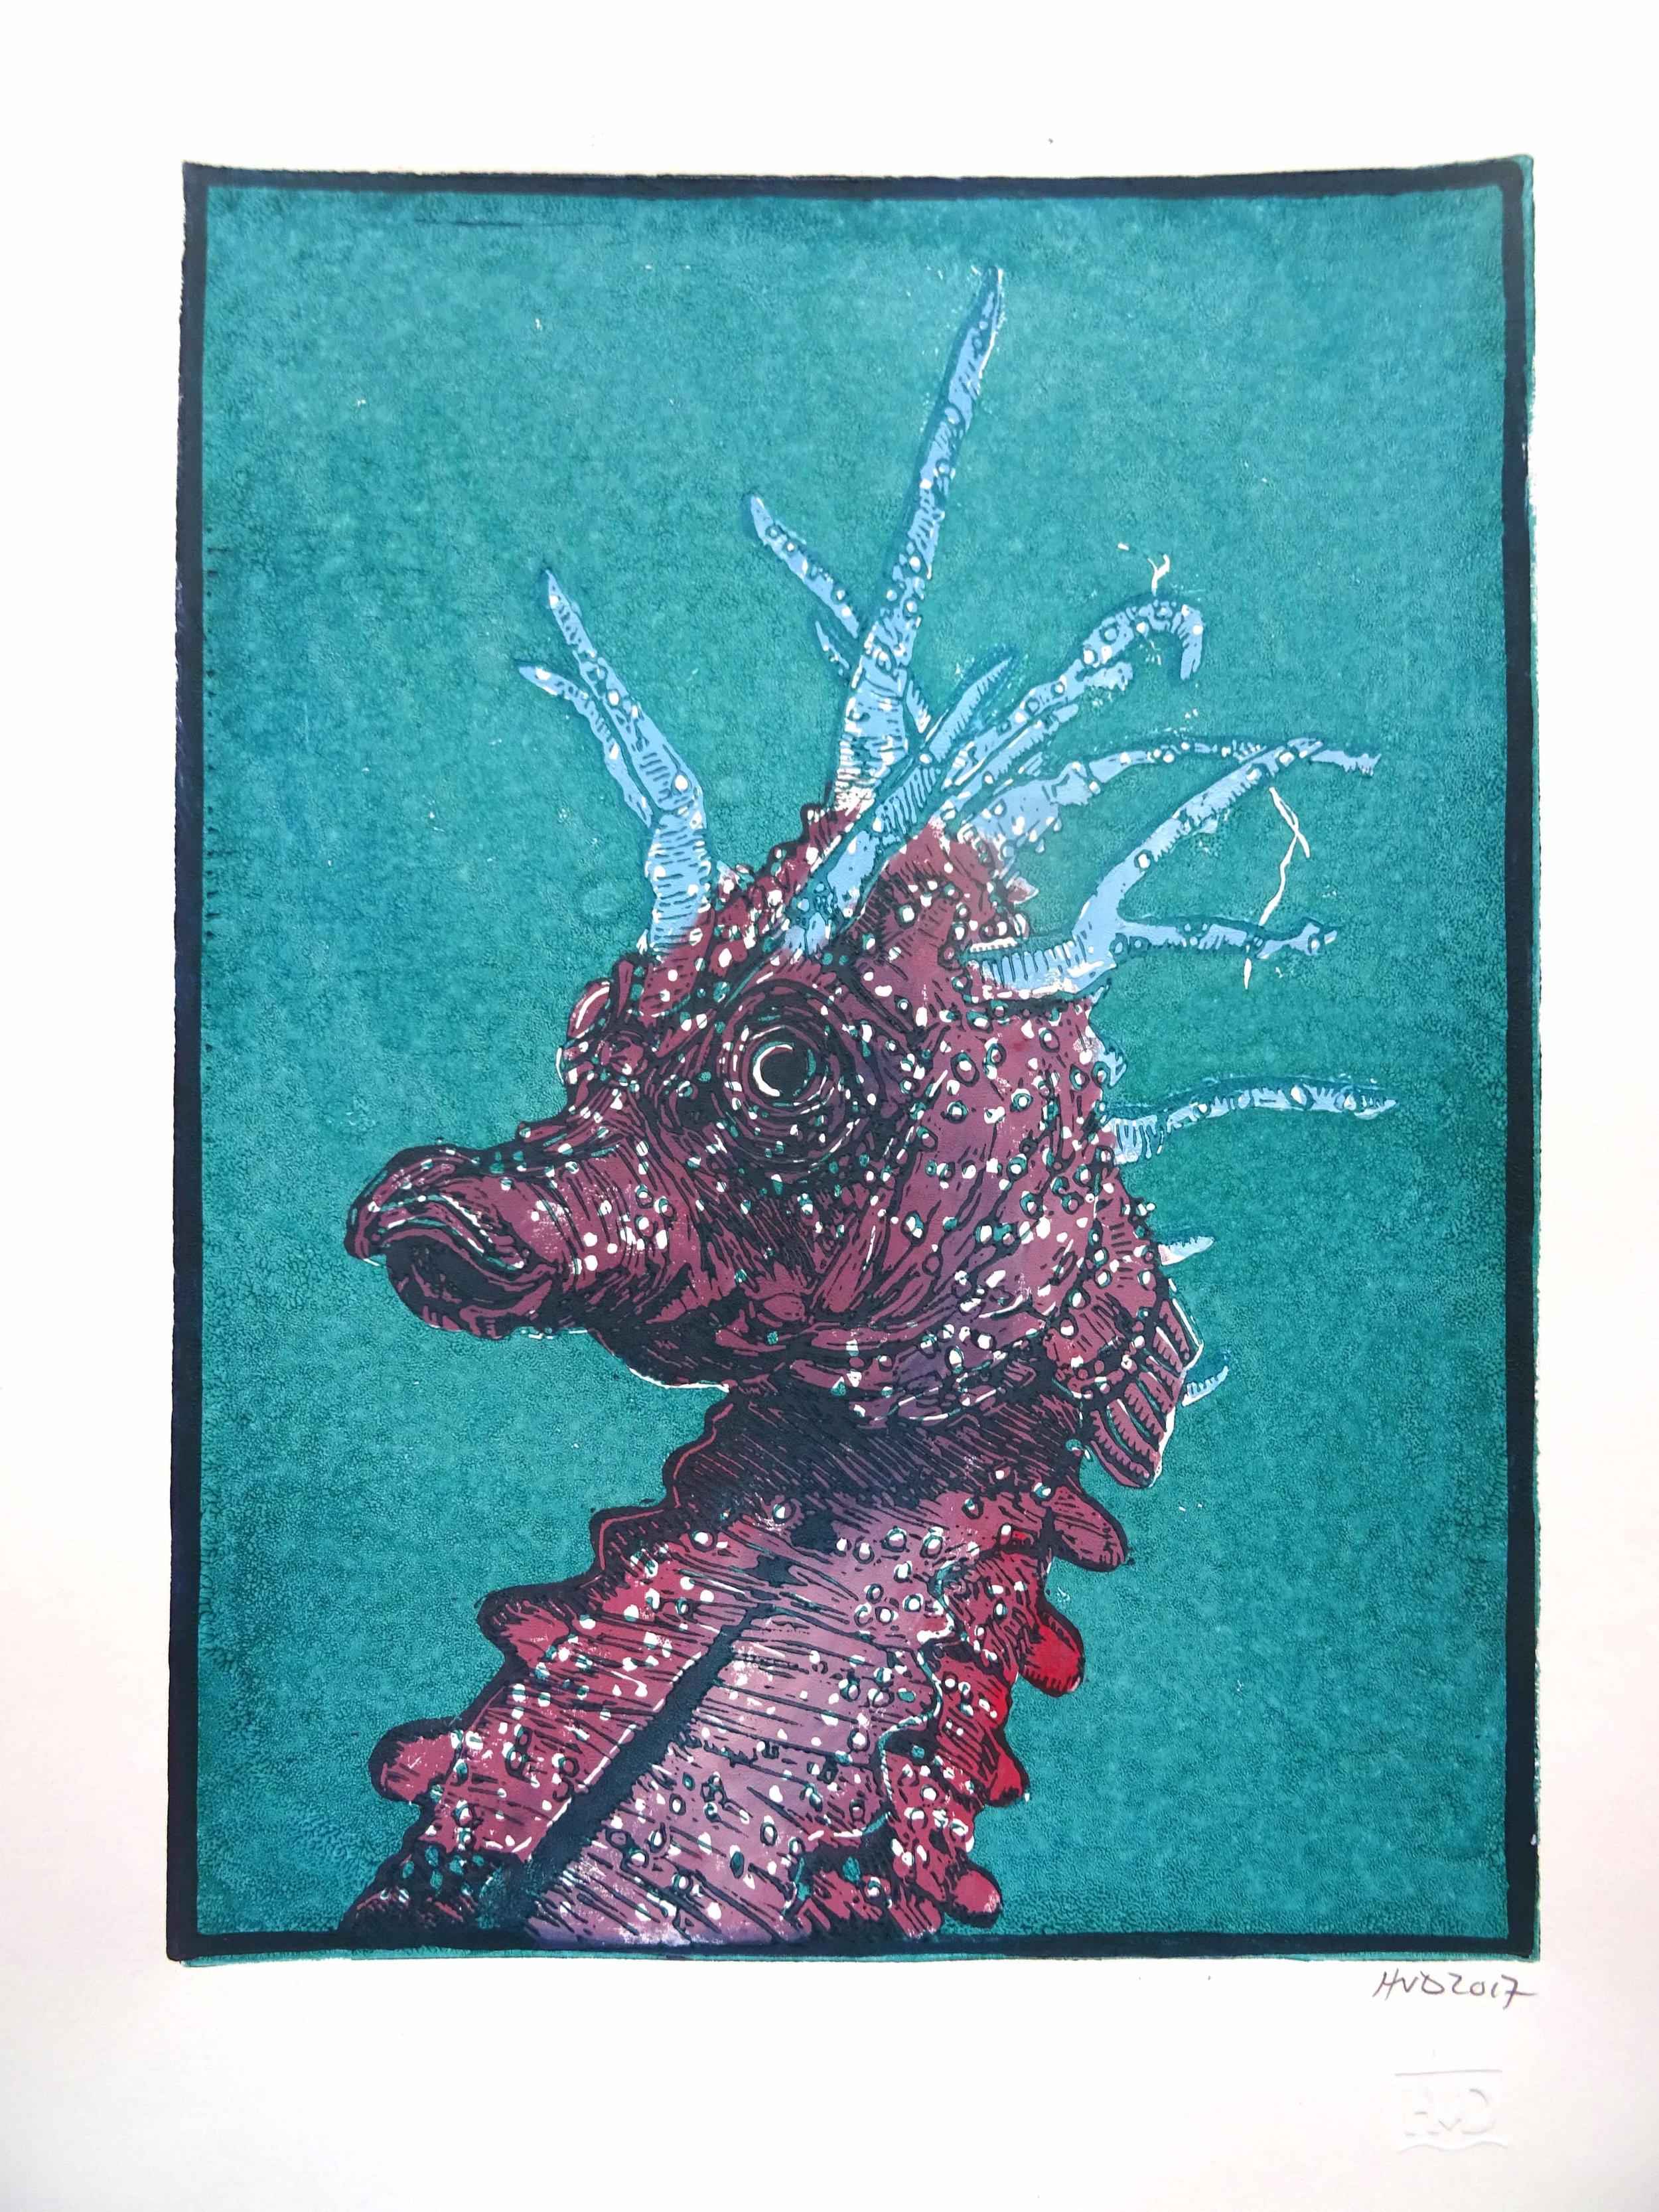 171-3, hippocampe 2, 28x21cm, 2-plate lino, 80 €